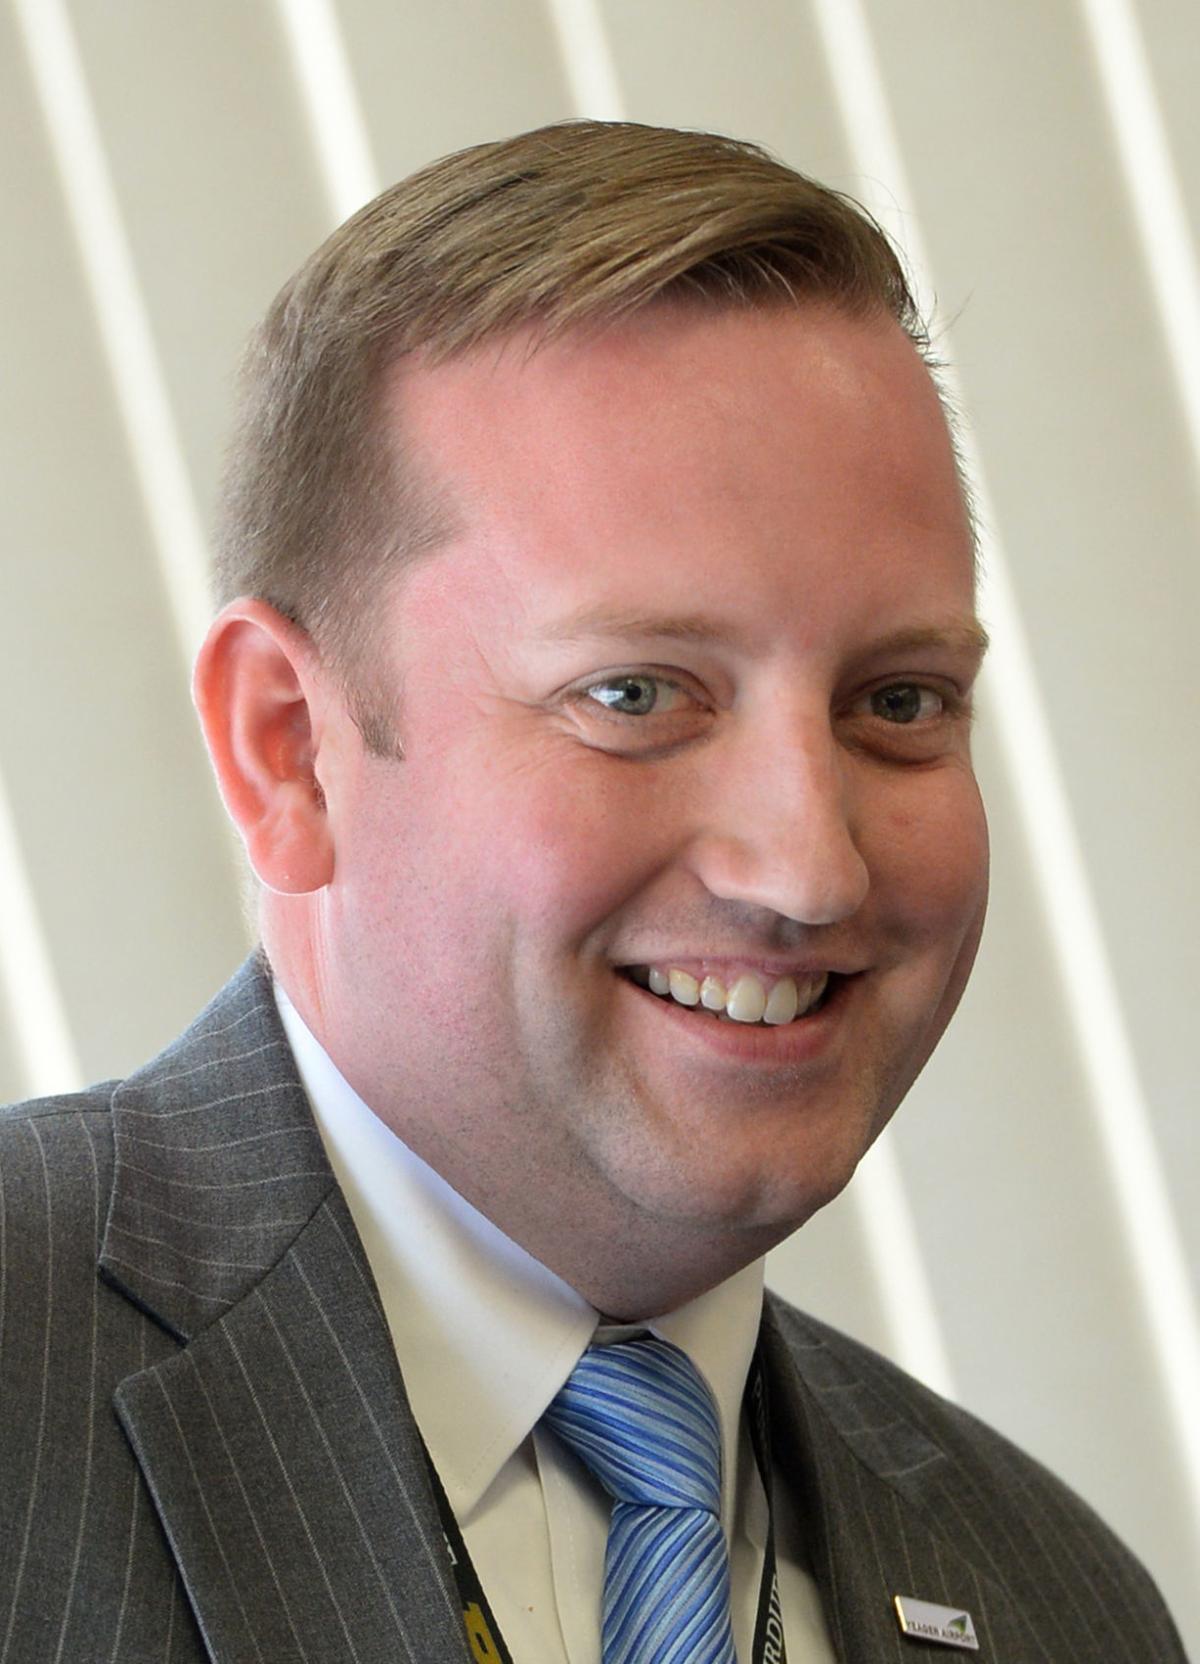 Nick Keller